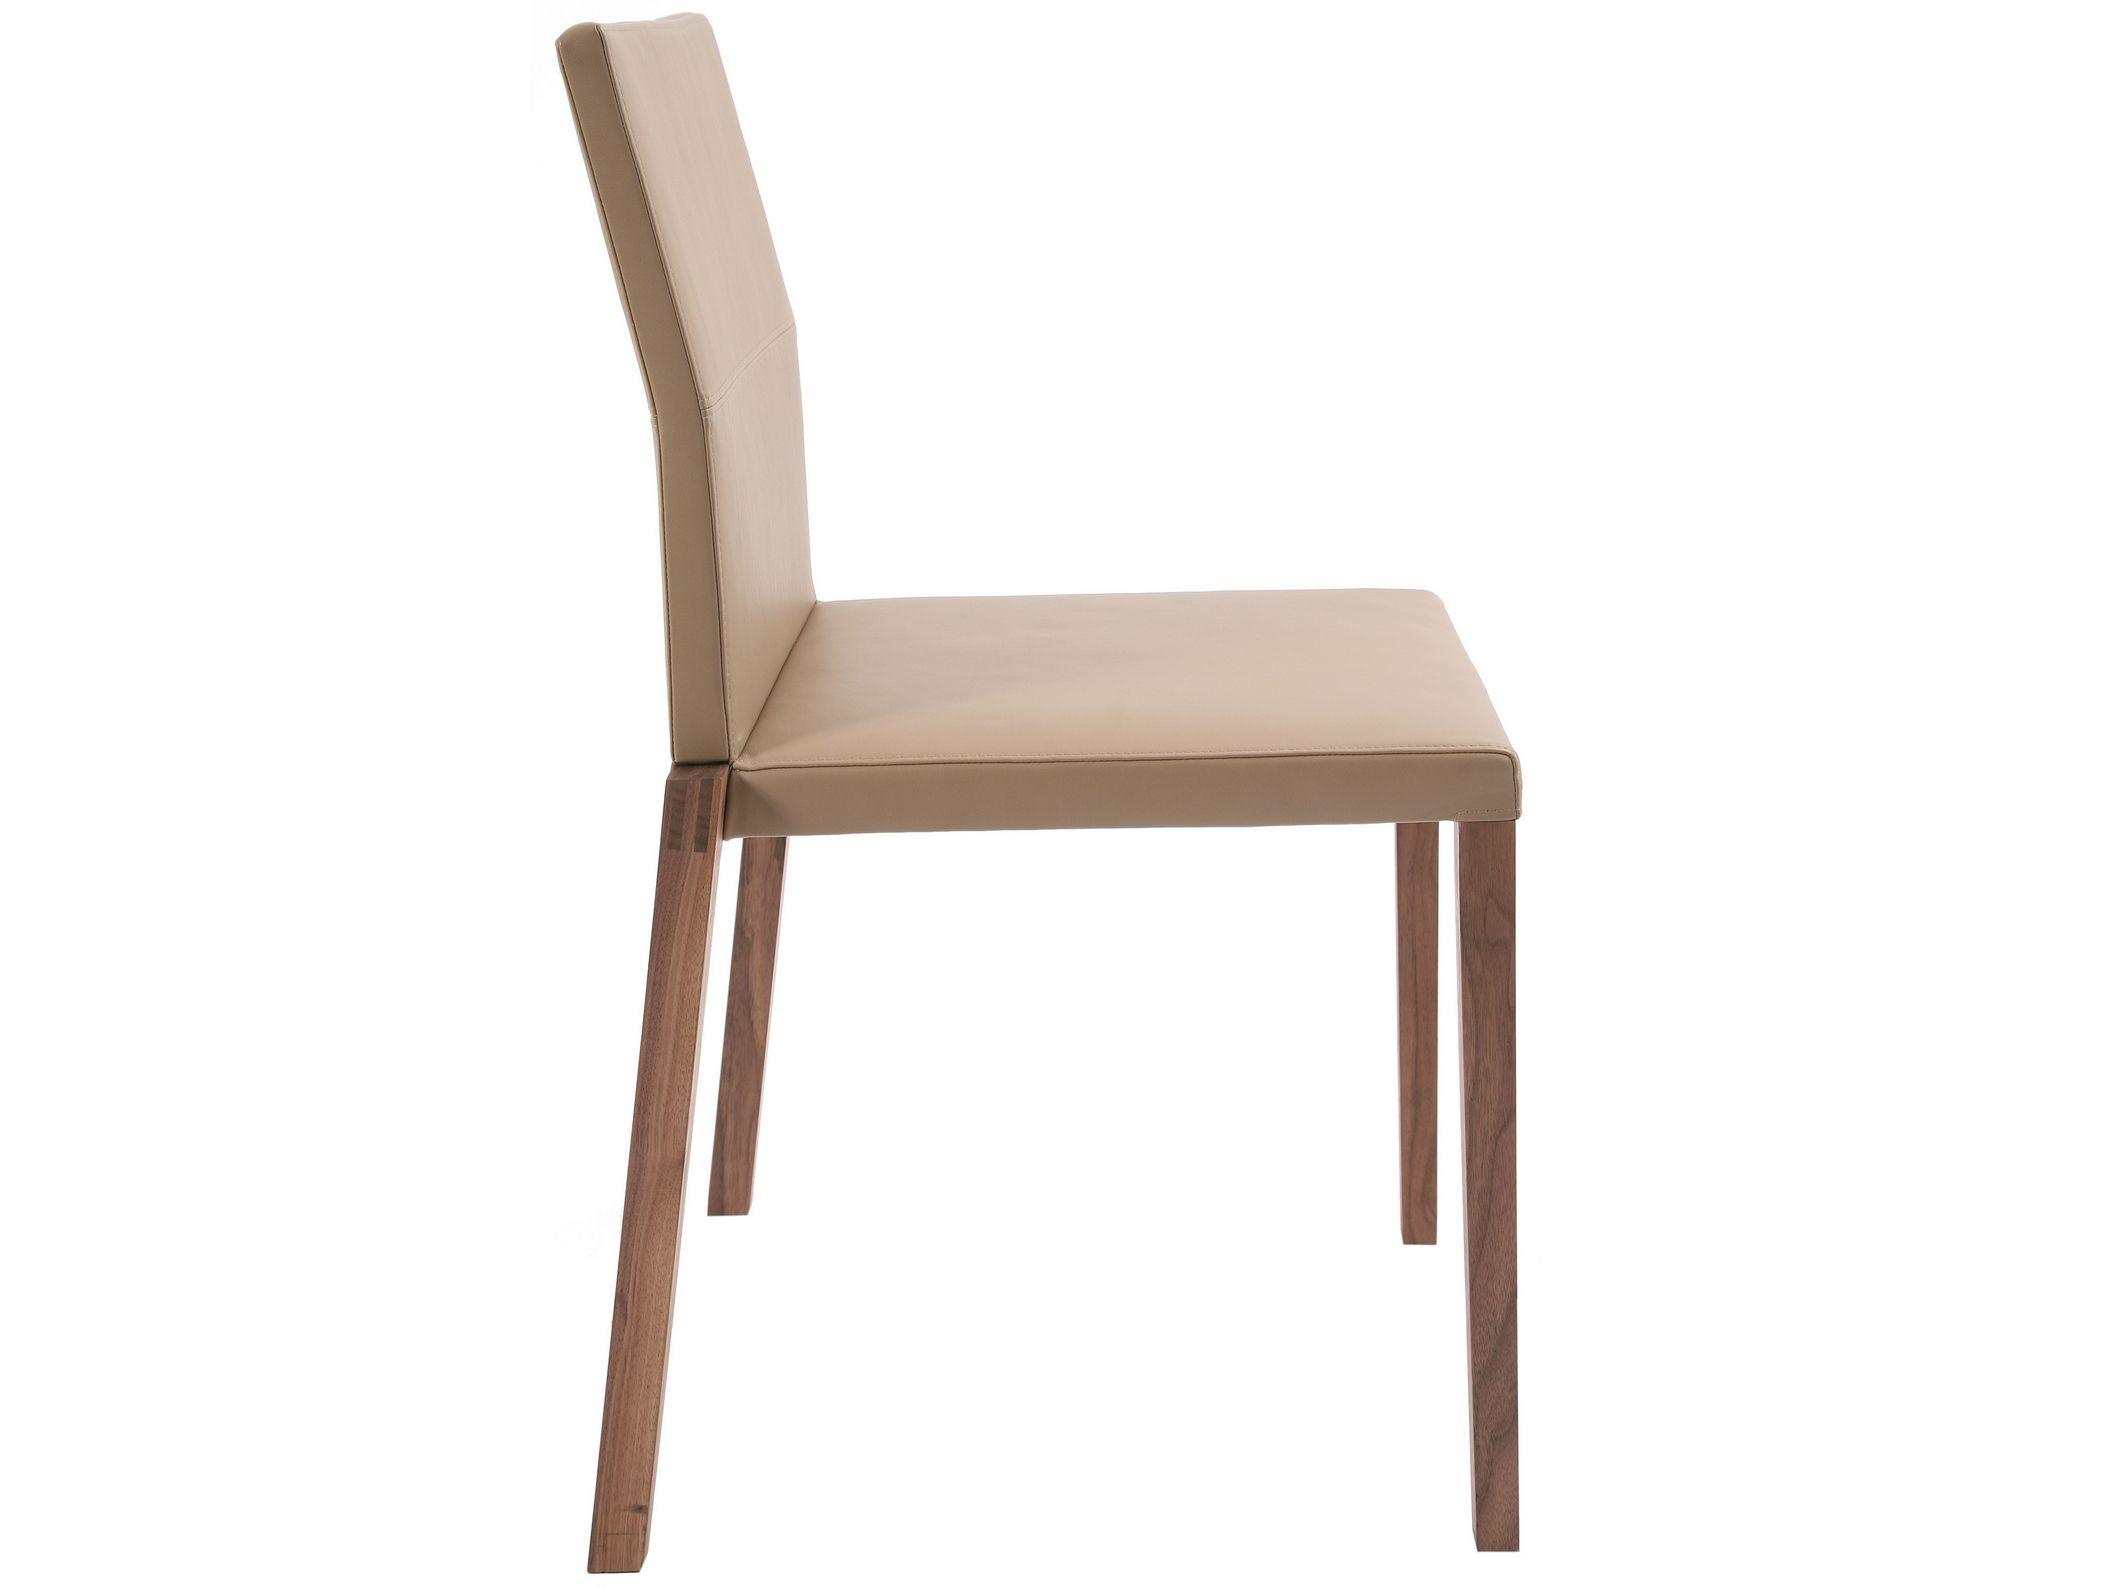 baltas chaise en cuir by kff design hauke murken sven hansen. Black Bedroom Furniture Sets. Home Design Ideas